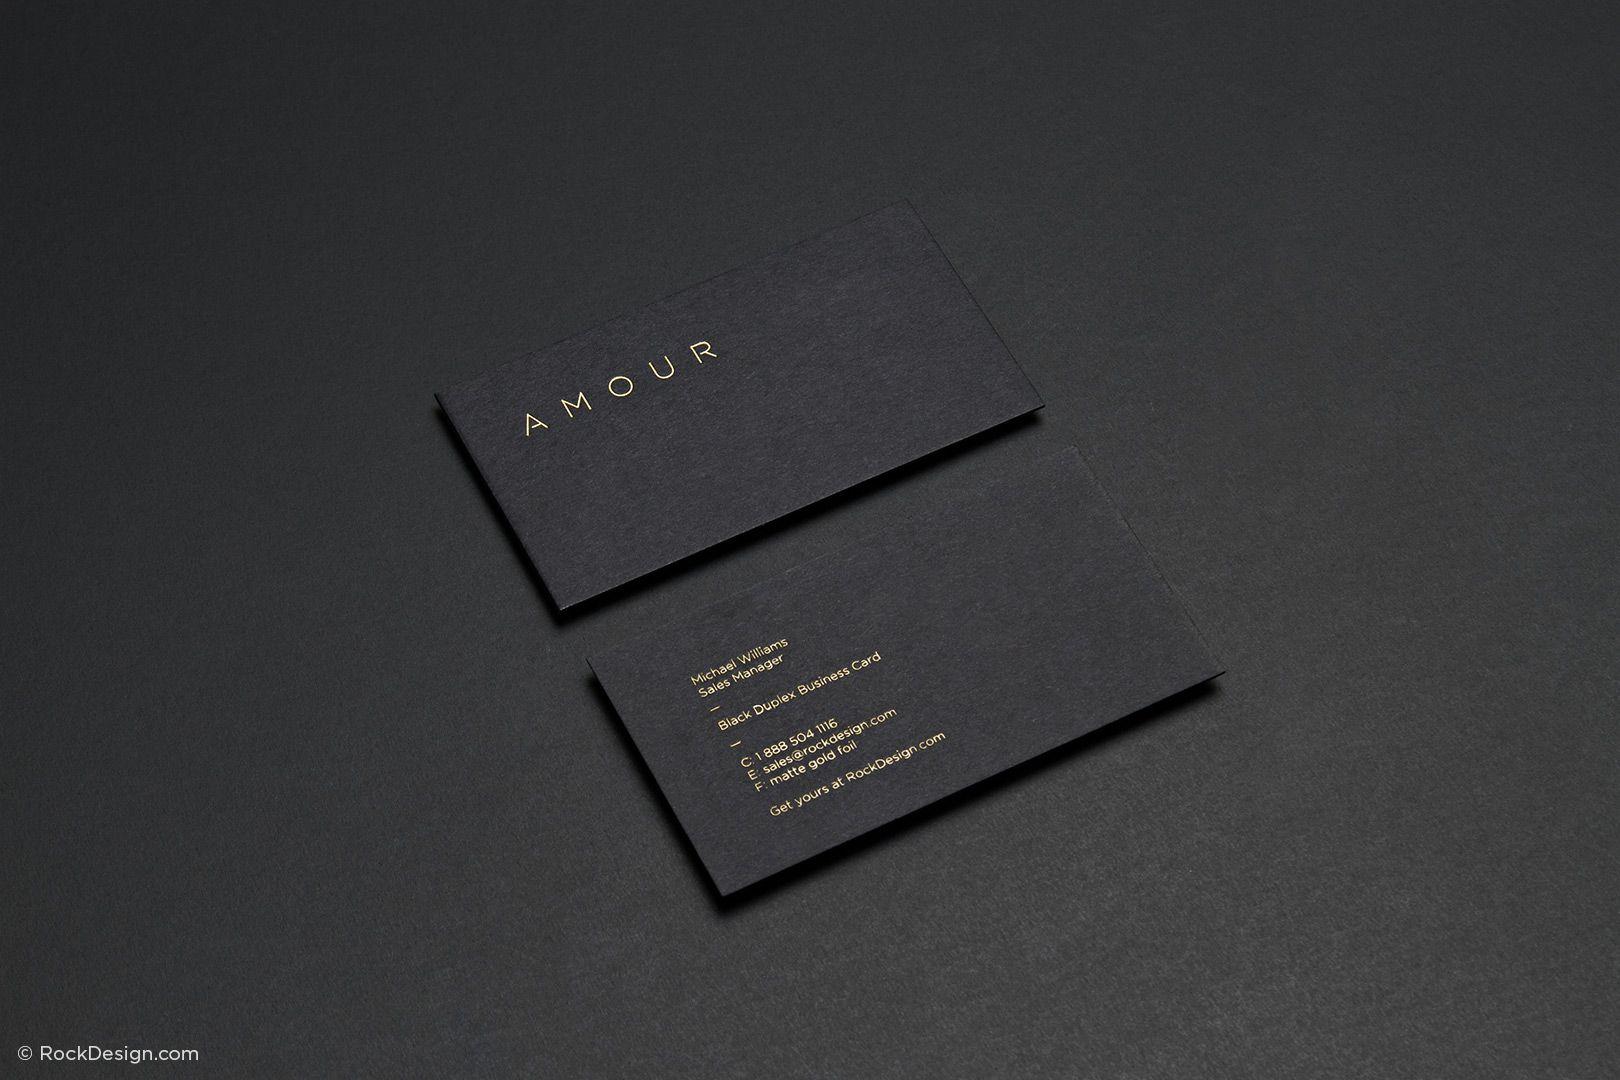 Fancy unique black business card design template amour fancy unique black business card design template amour rockdesign luxury business card printing magicingreecefo Gallery